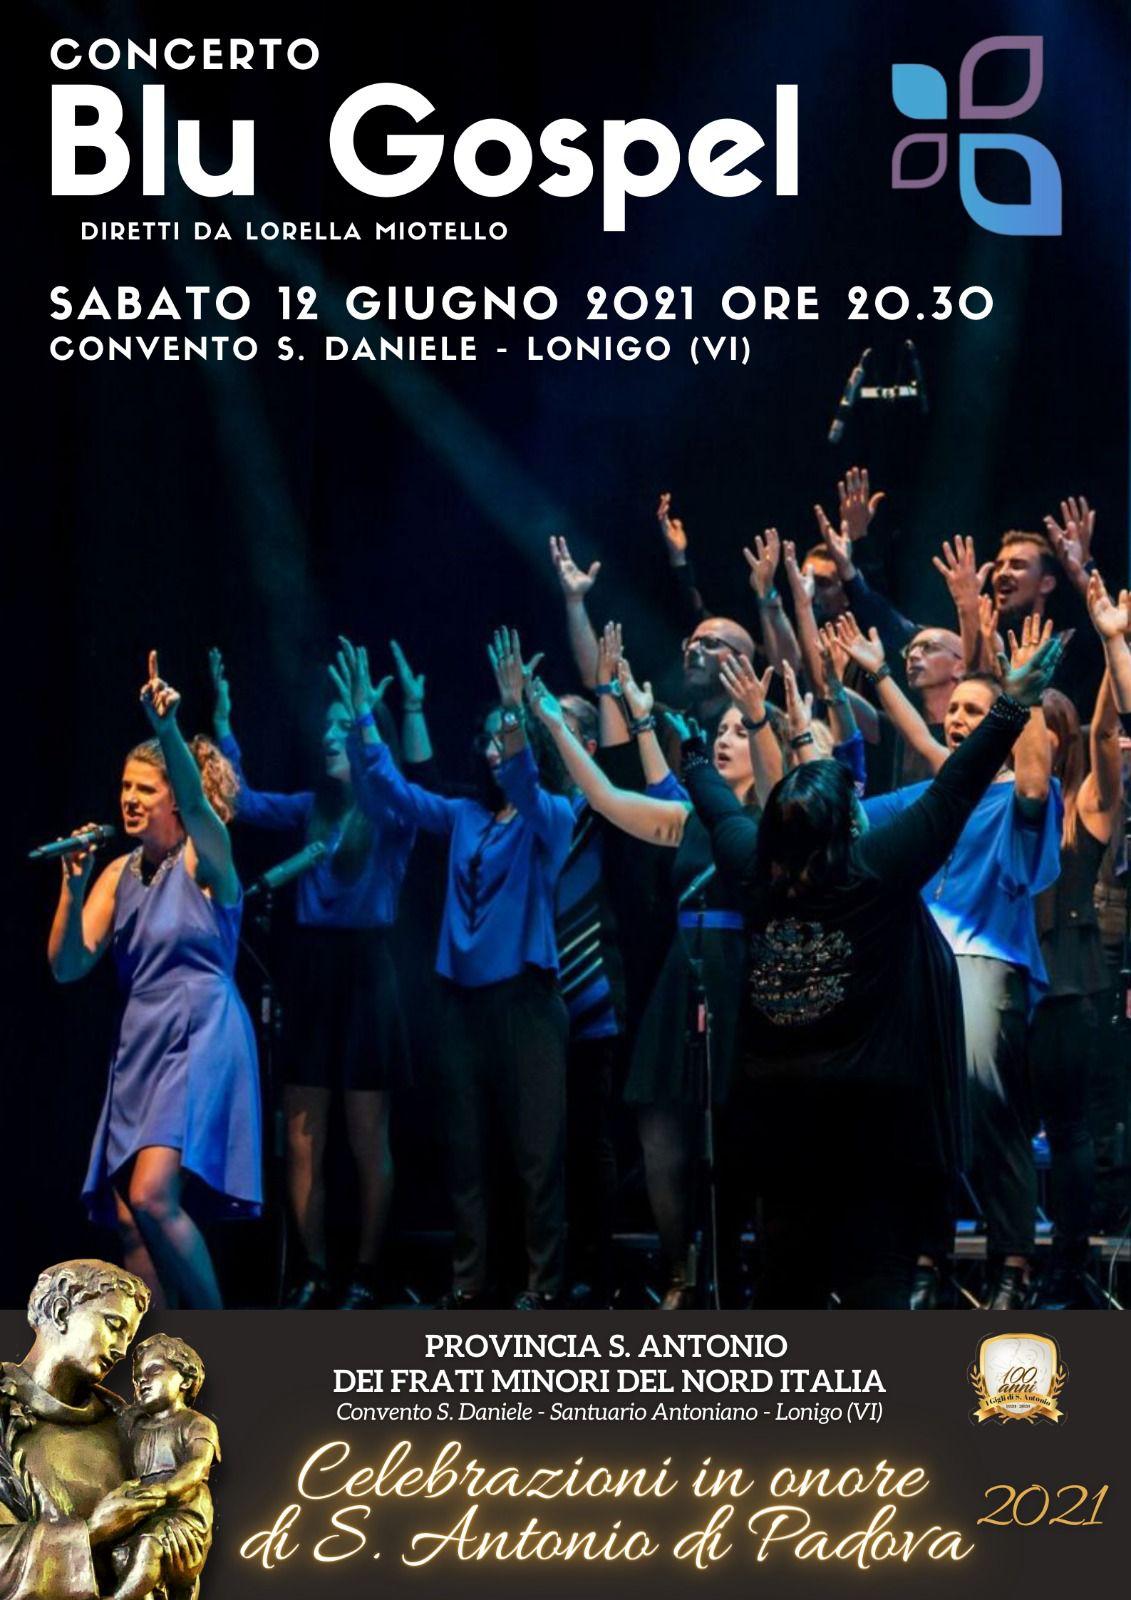 Concerto Convento S. Daniele - Lonigo (VI)